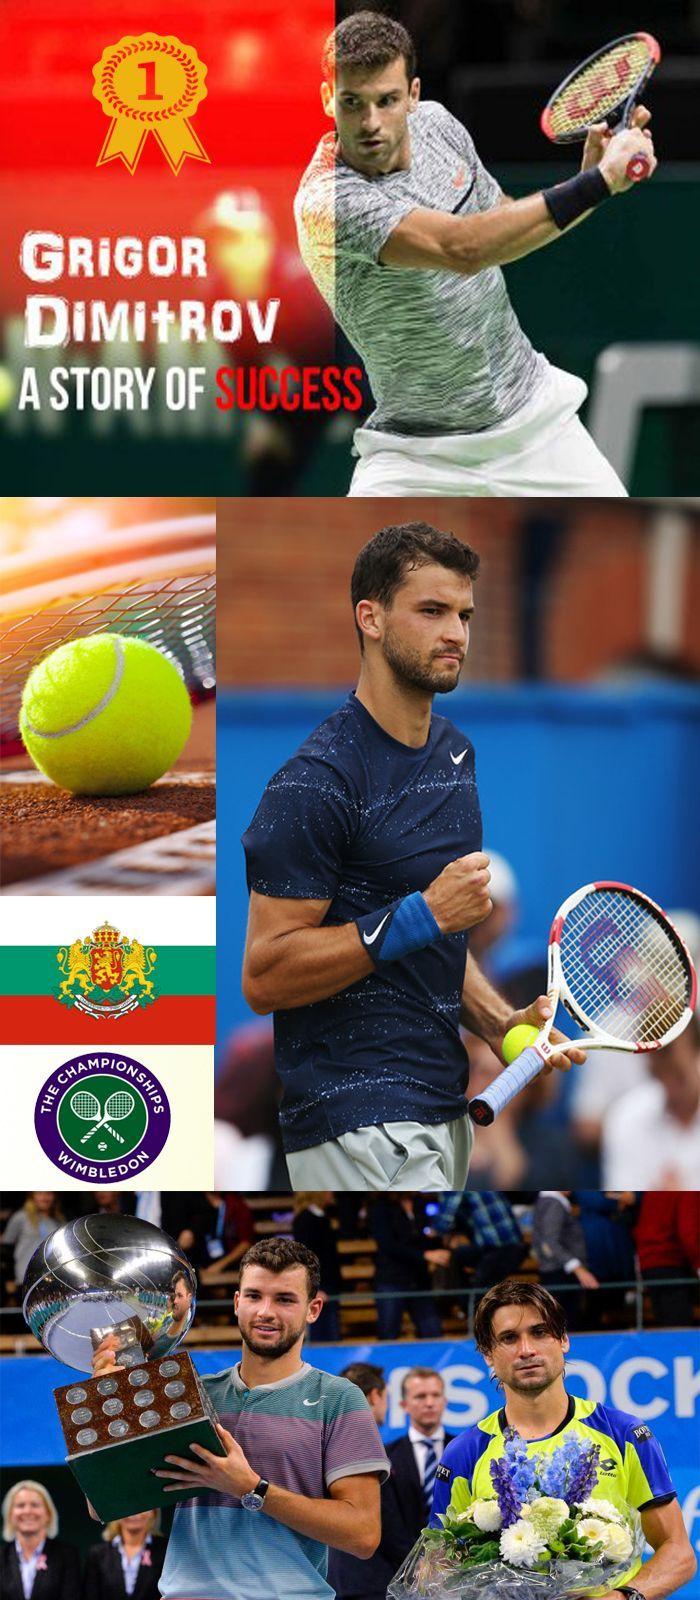 #grigordimitrov #tennis #usopen Grigor Dimitrov met 2017 with his fifth title in ATP 250 in Brisbane. At Australia, Open Tour Dimitrov ranked for the Grand Slam semifinals.